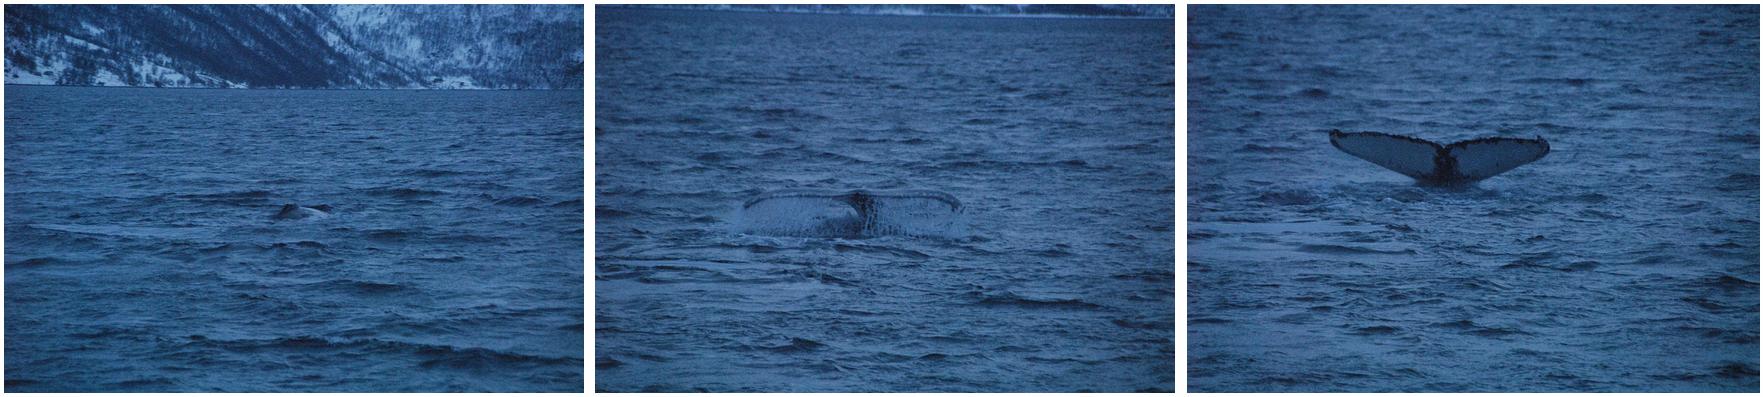 Whale watching | Whalesafari Tromsø